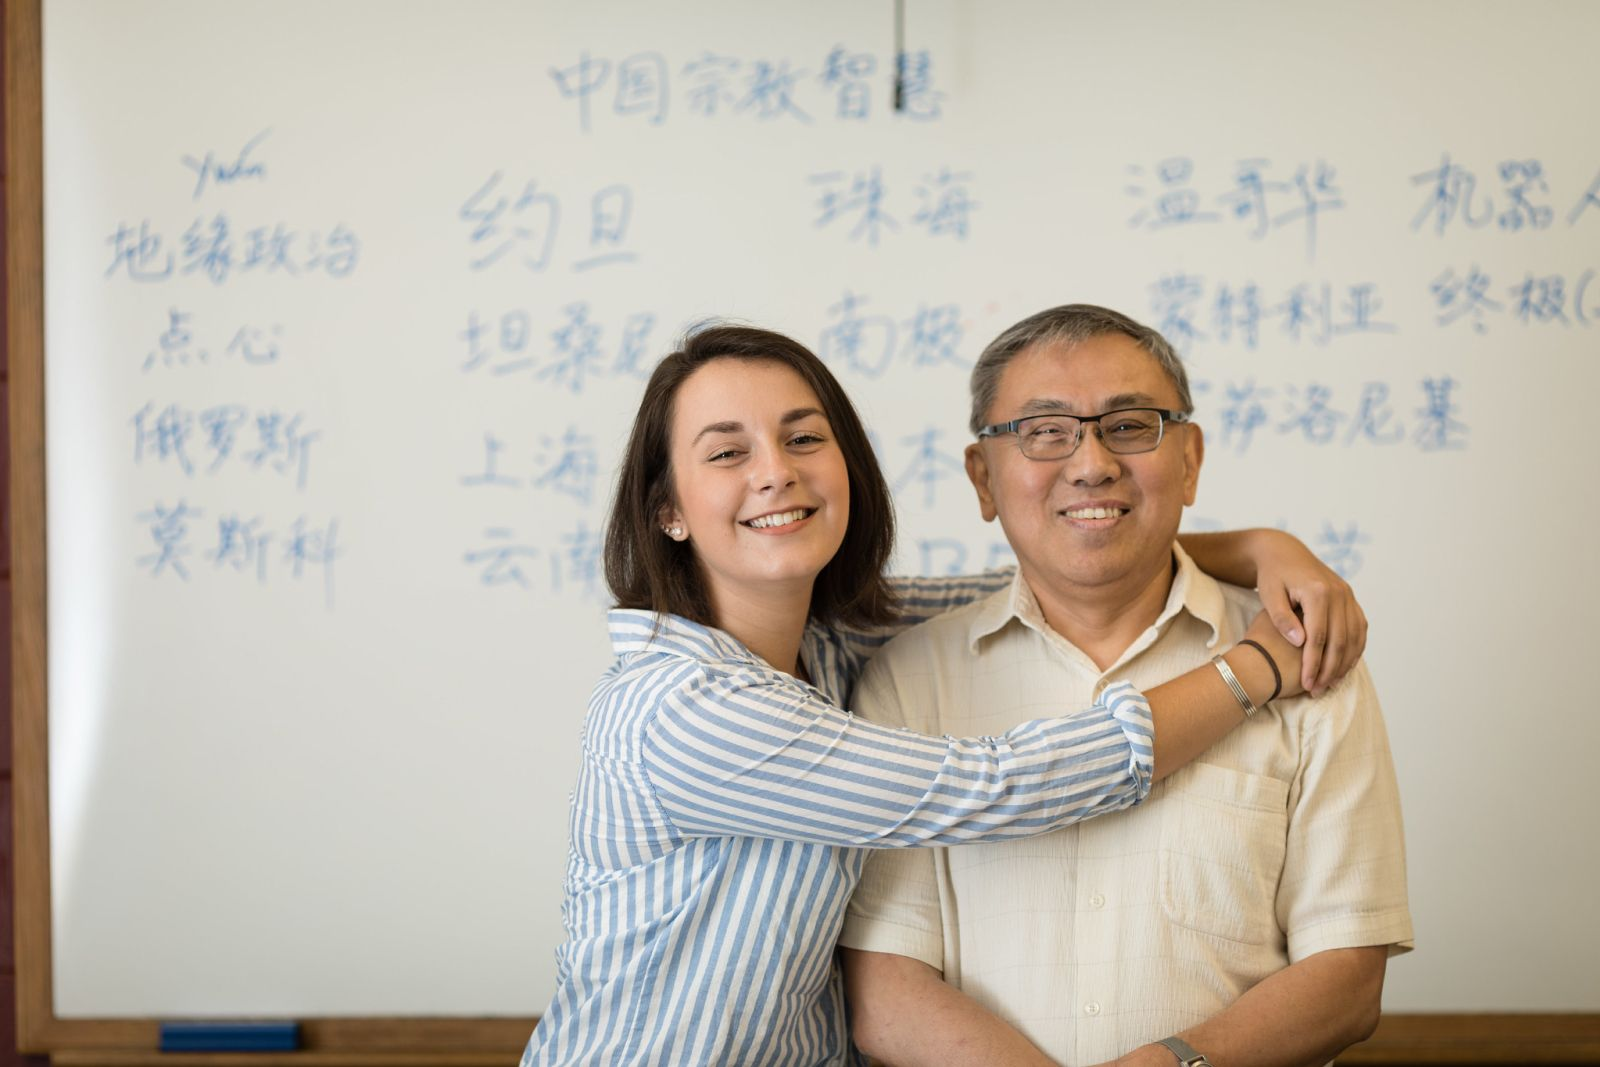 Karina Barbesino and modern languages professor Li Wei